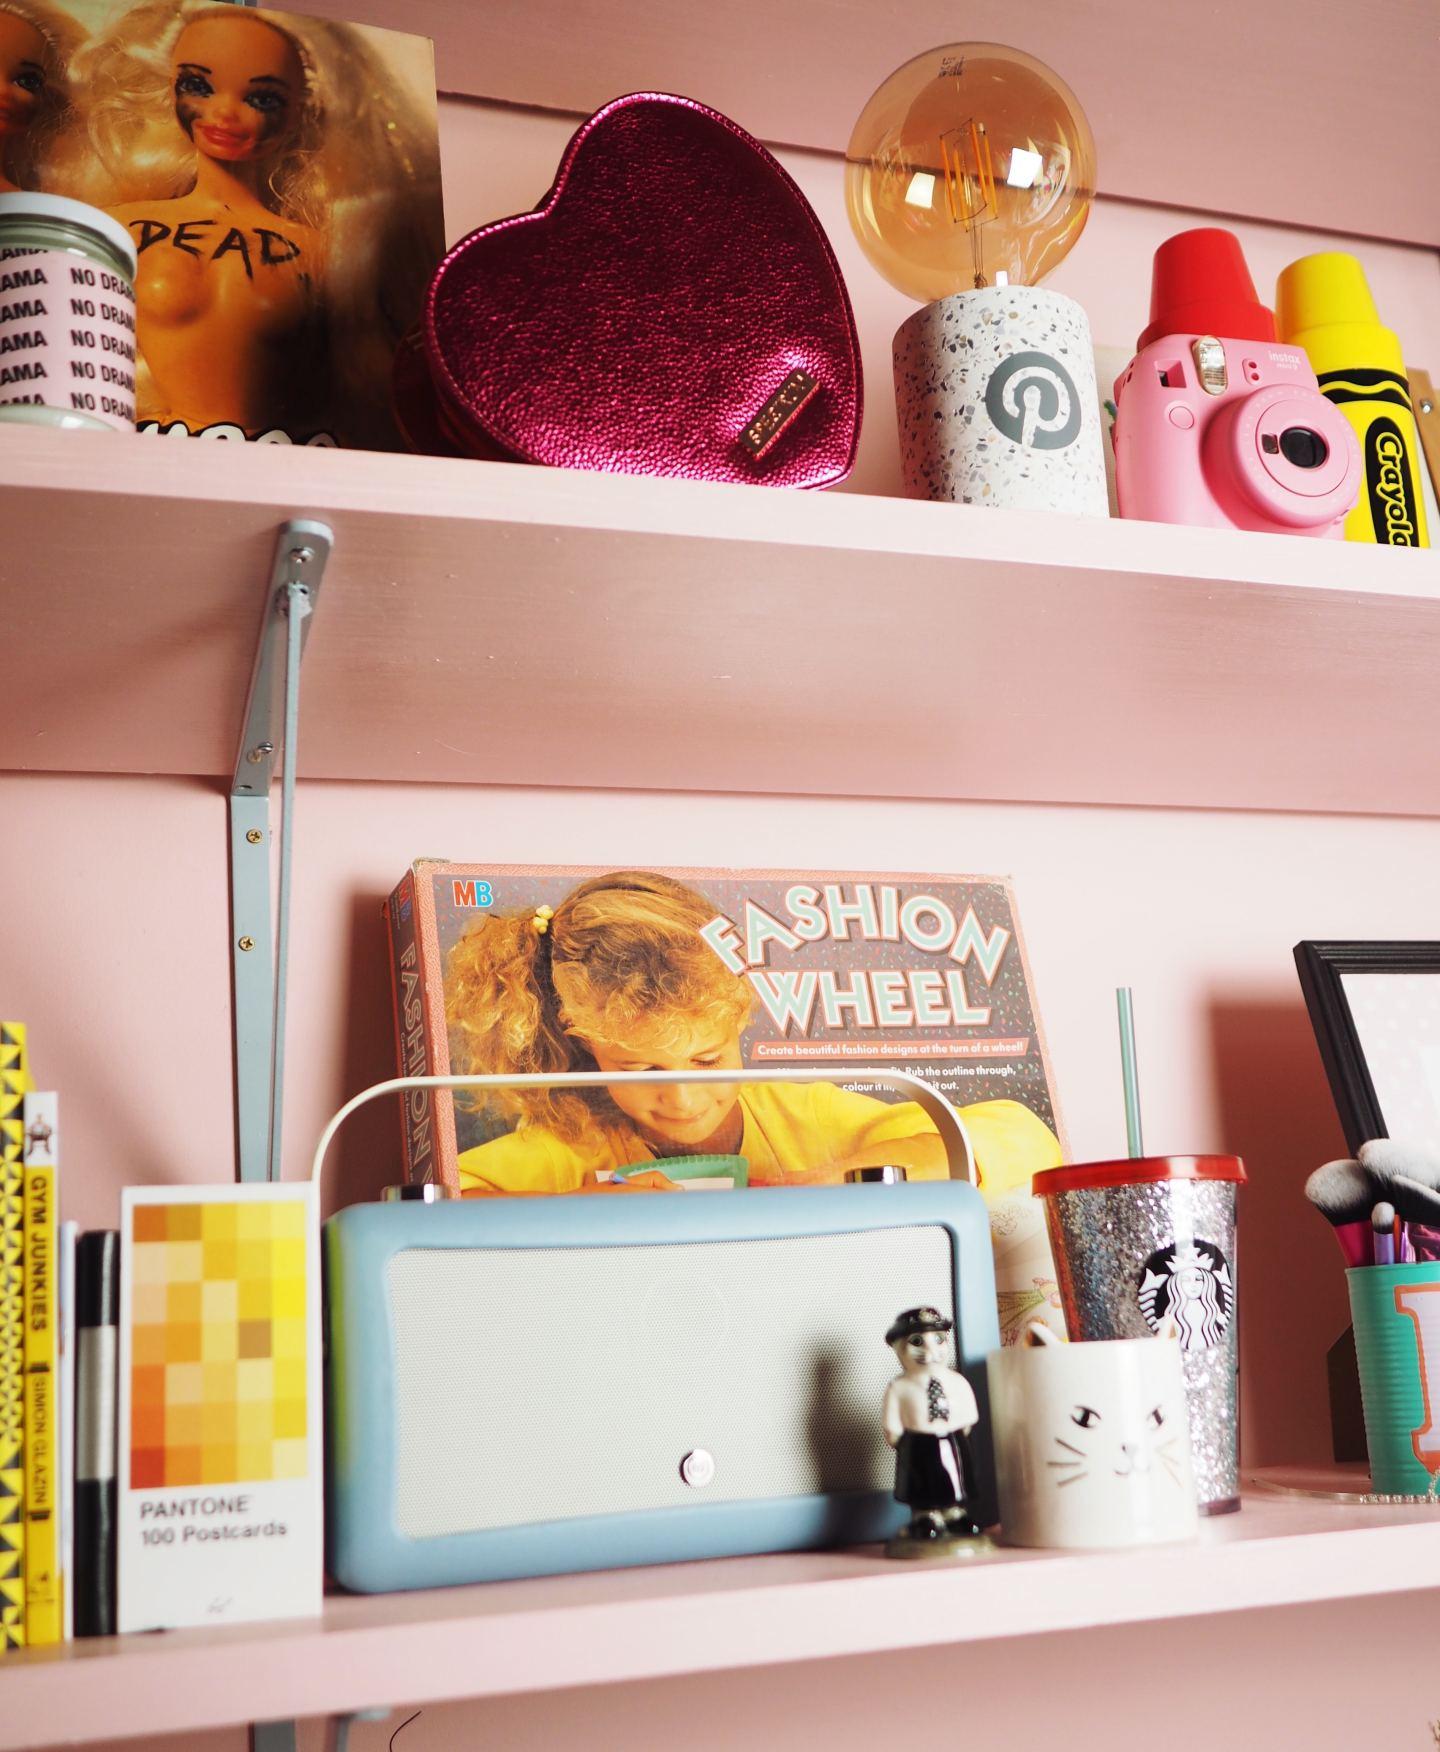 vintage retro pink shelfie dreamphone fashion wheel